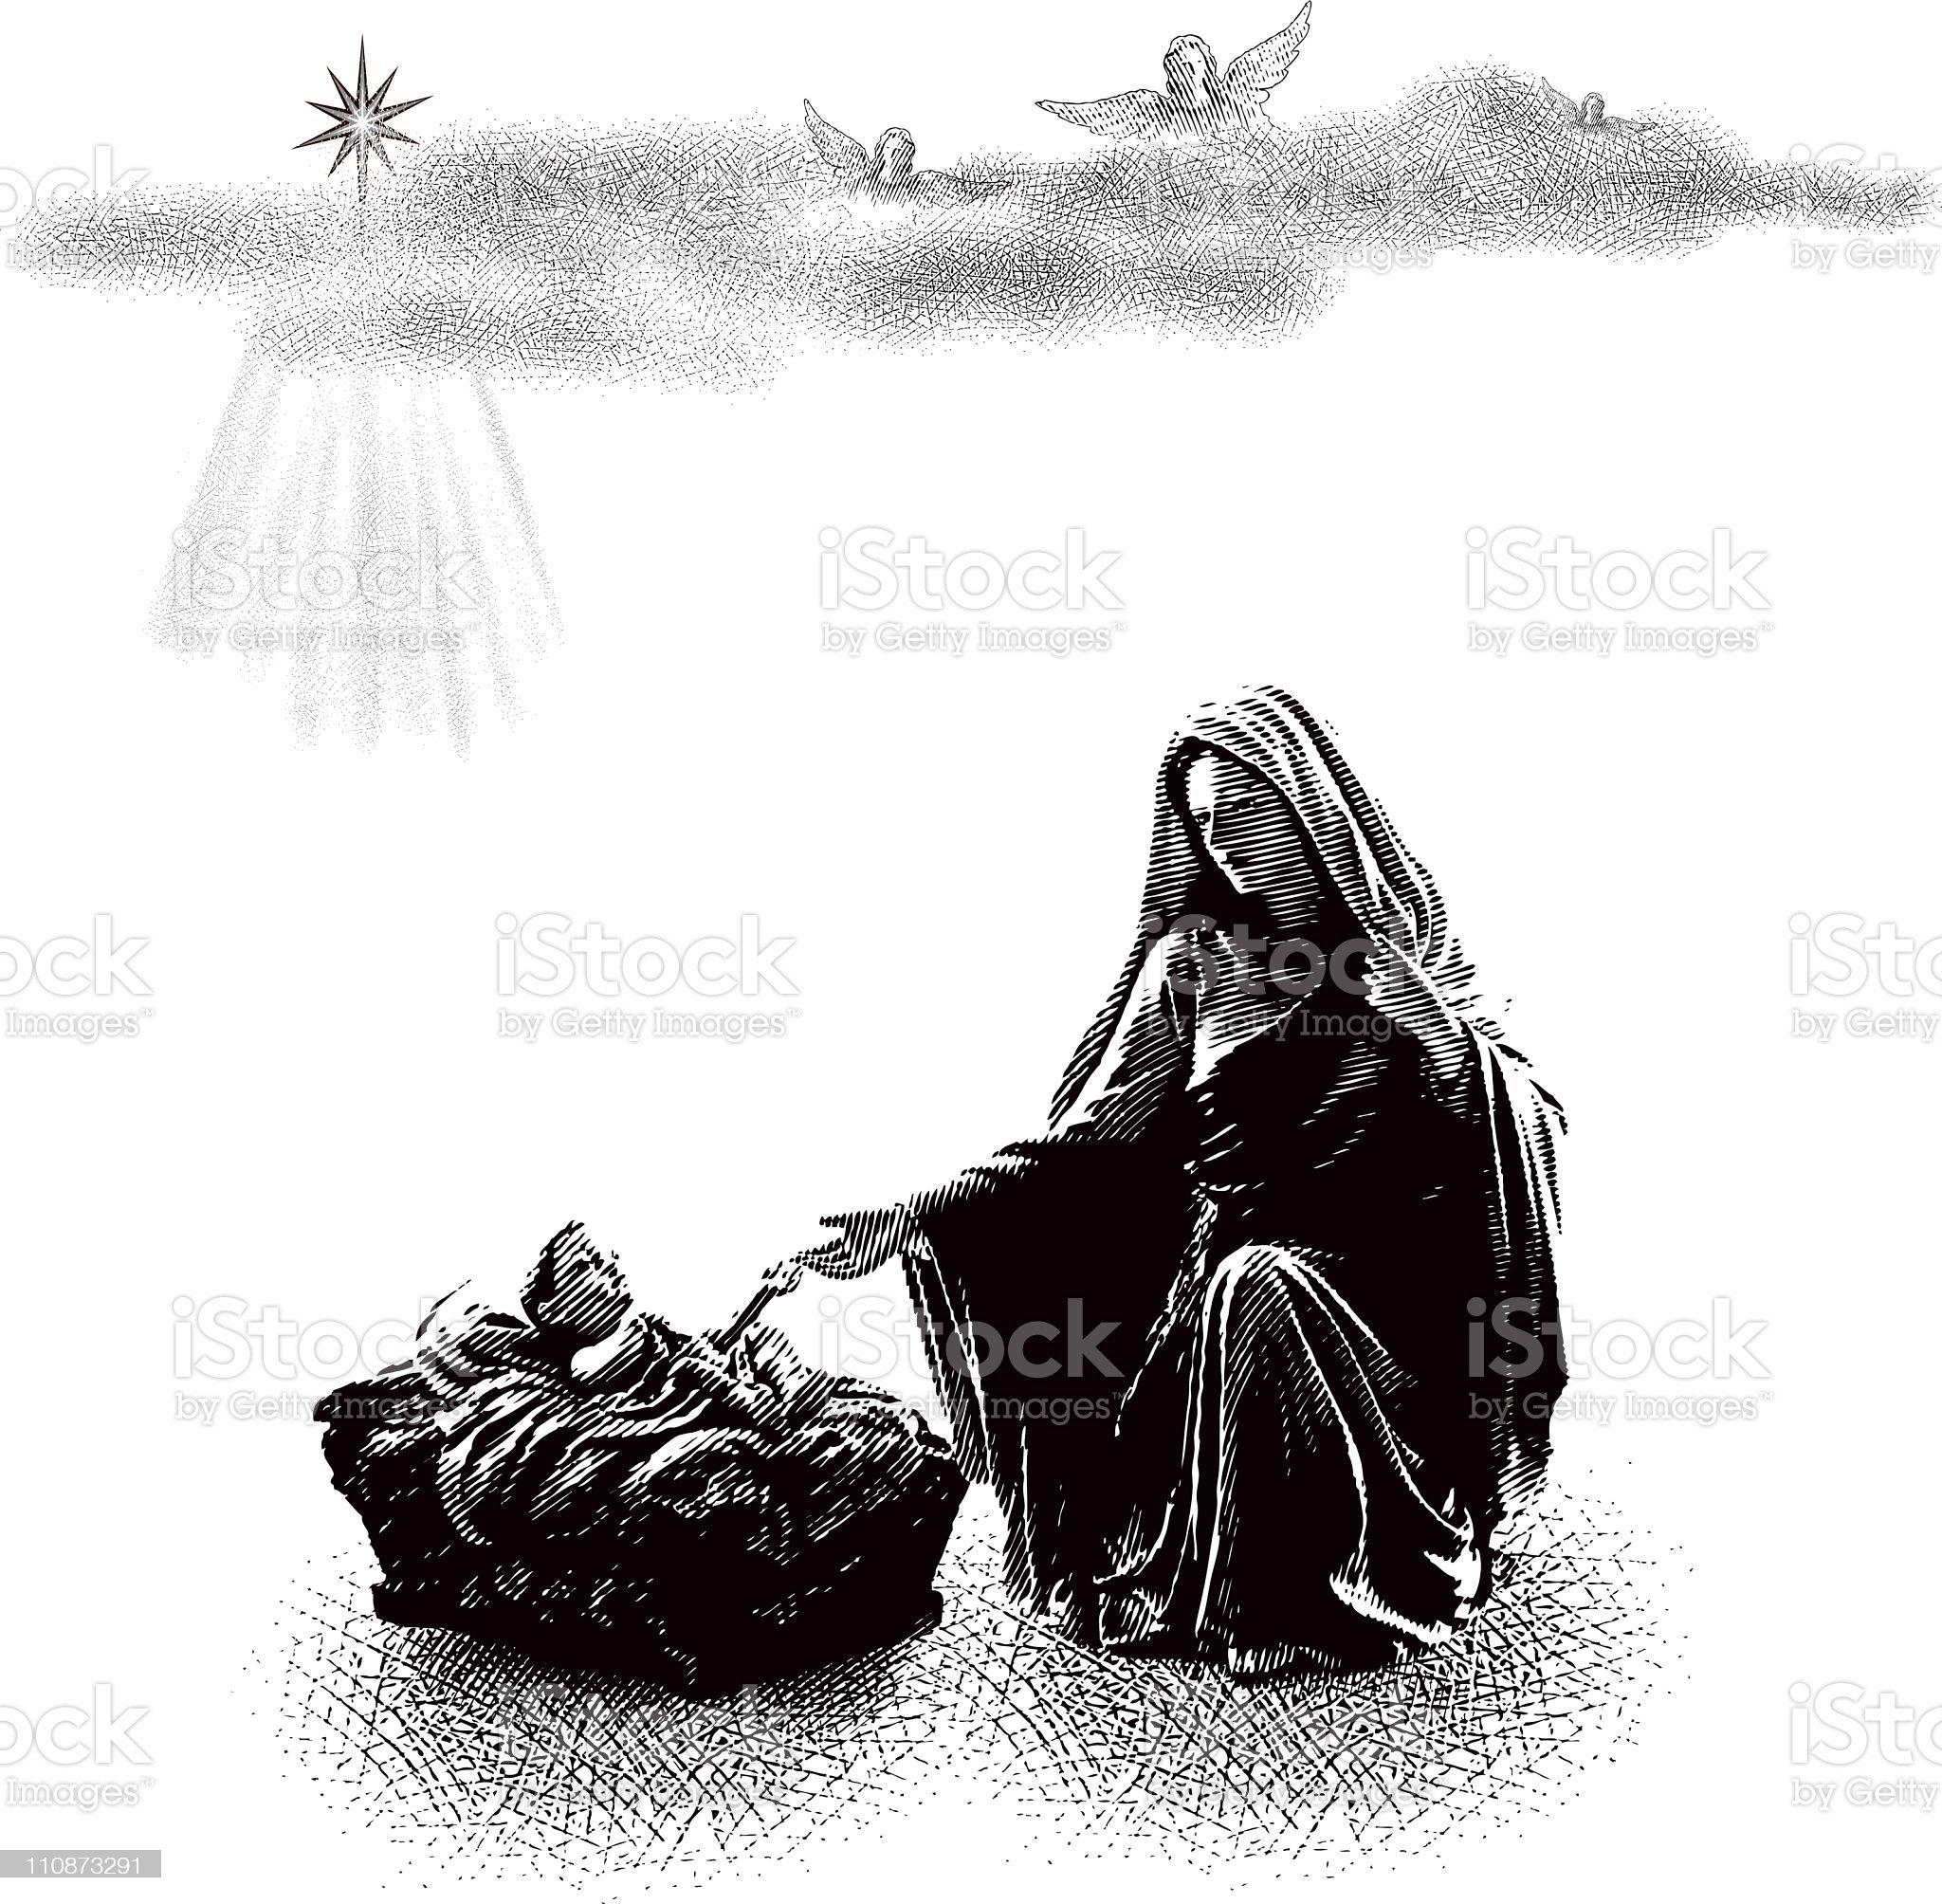 Baby Jesus and Virgin Mary royalty-free stock vector art